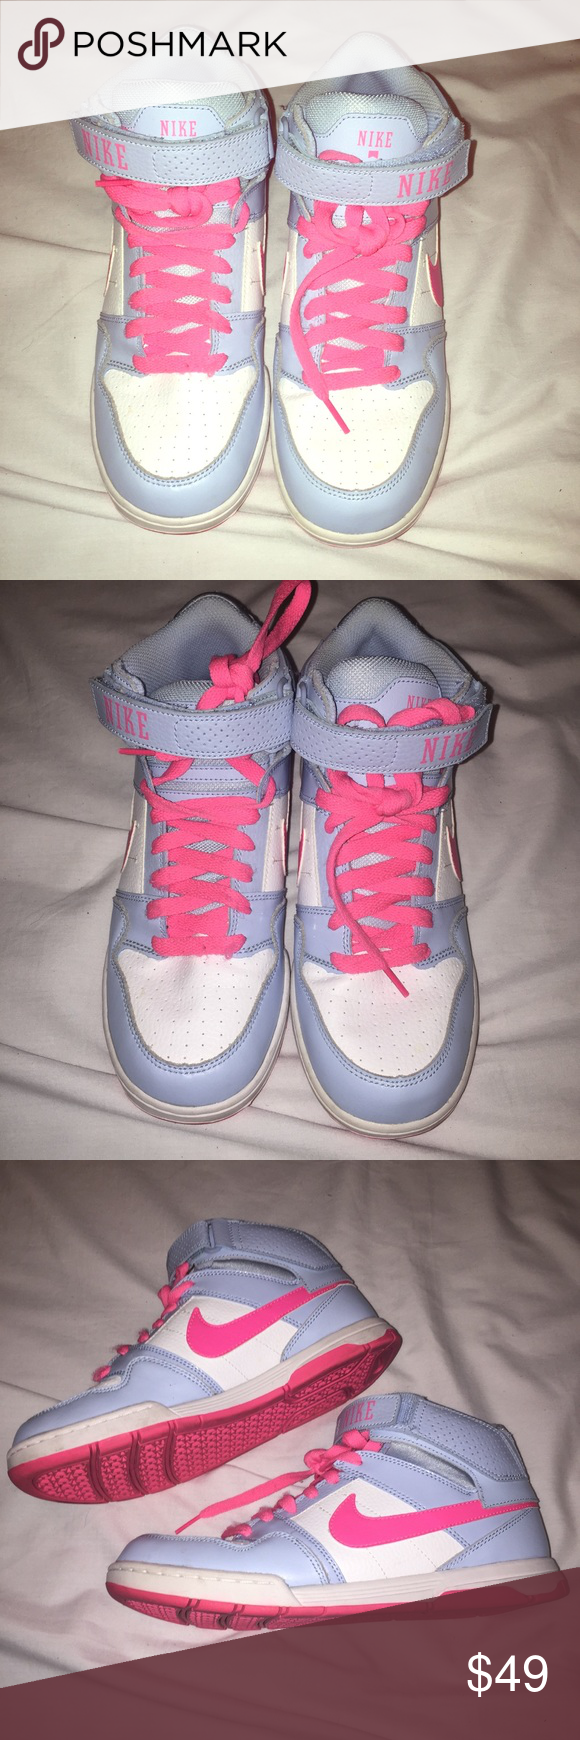 Hot pink soles. Hot pink Nike swoosh